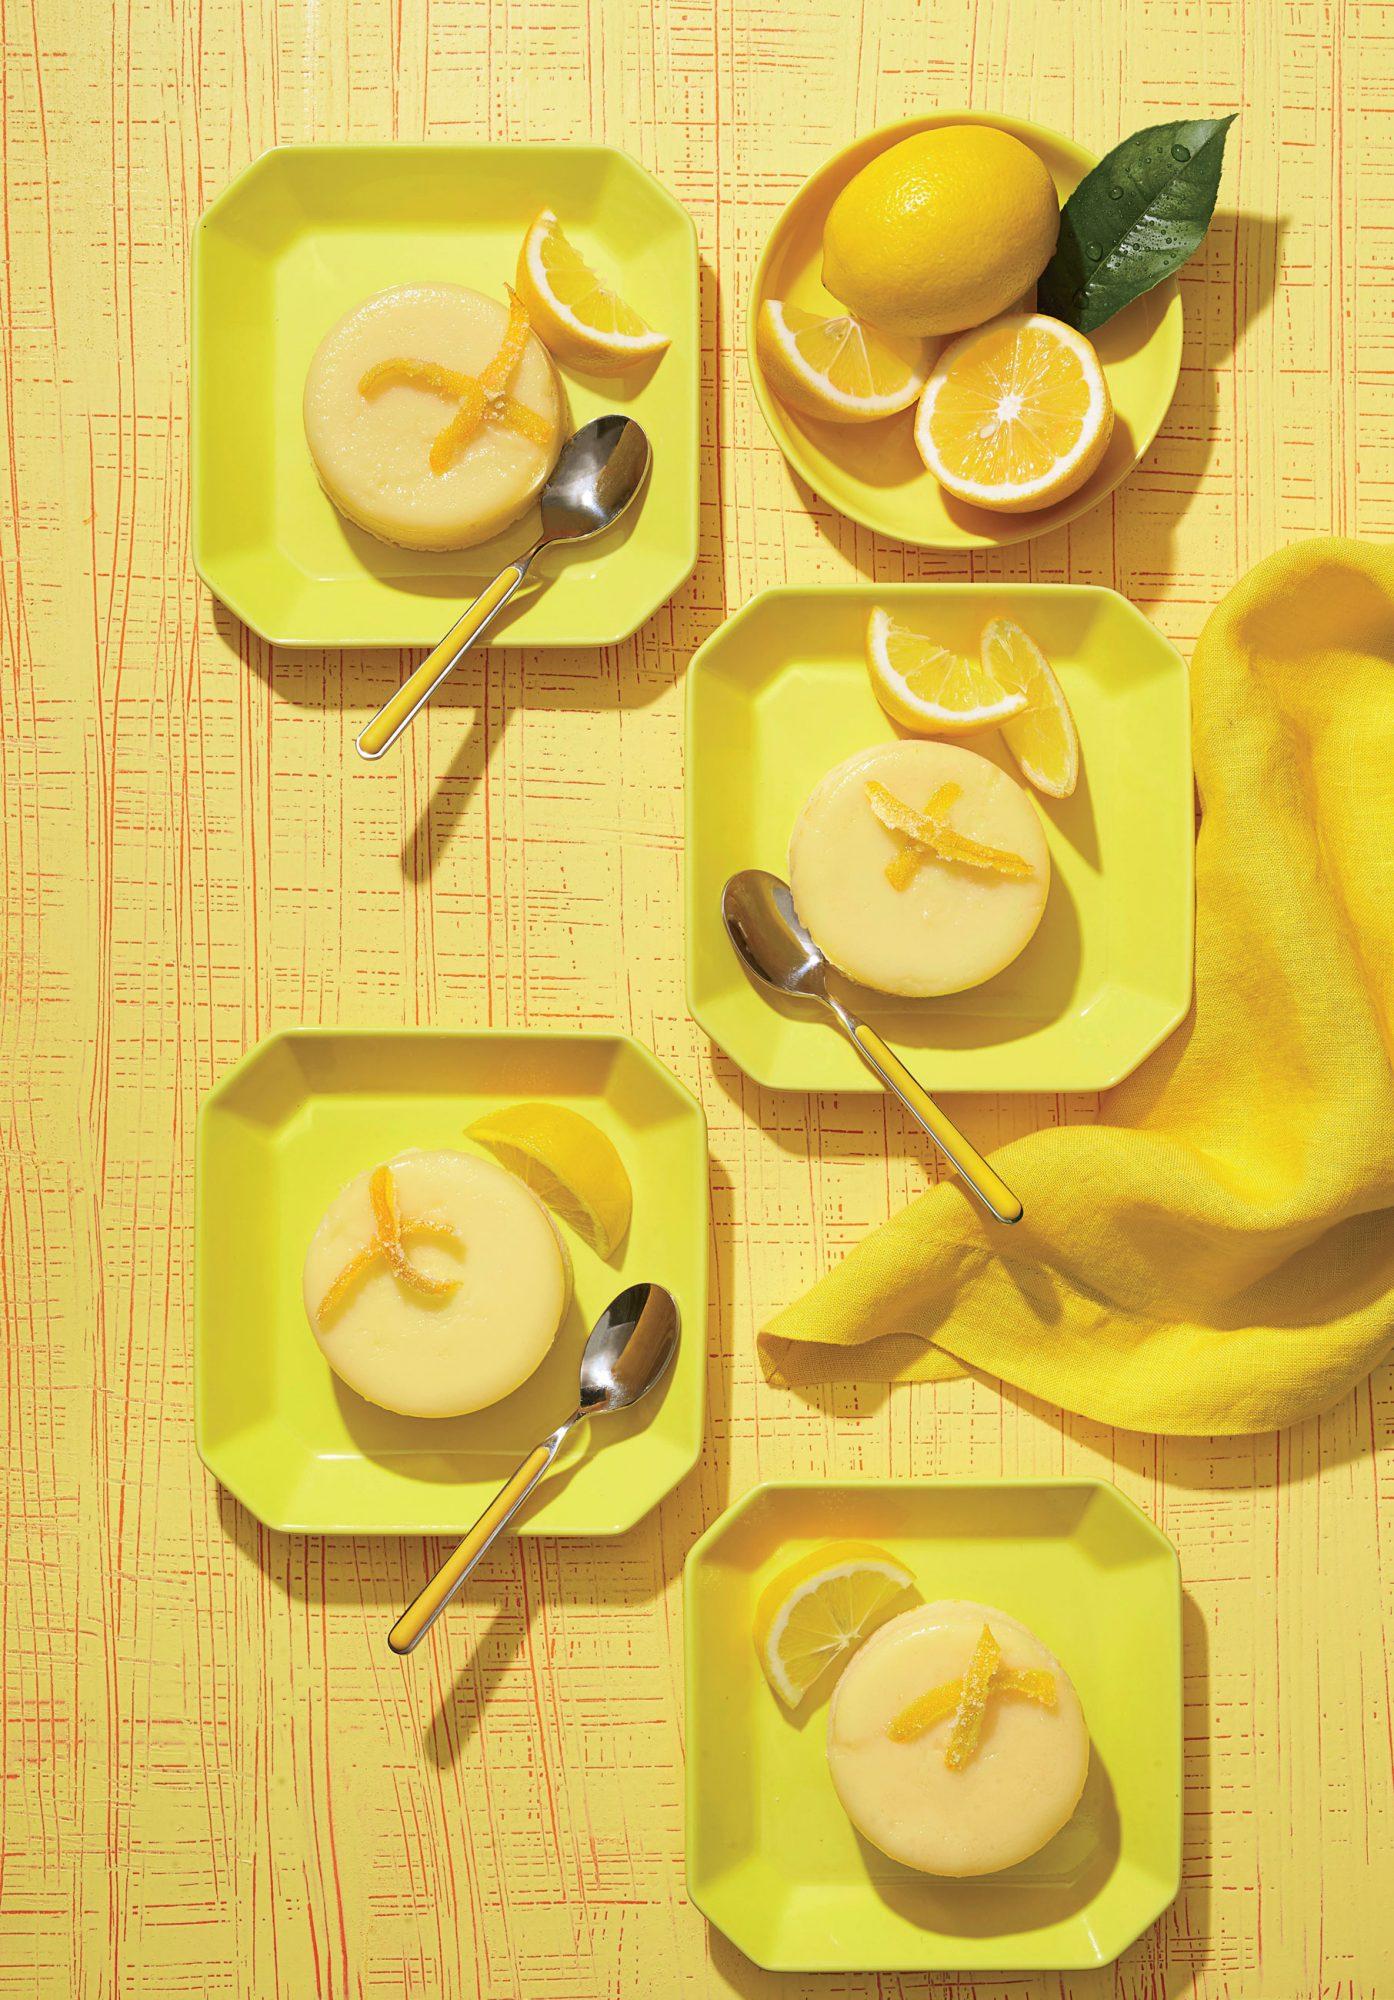 Meyer Lemon Sponge Pudding image